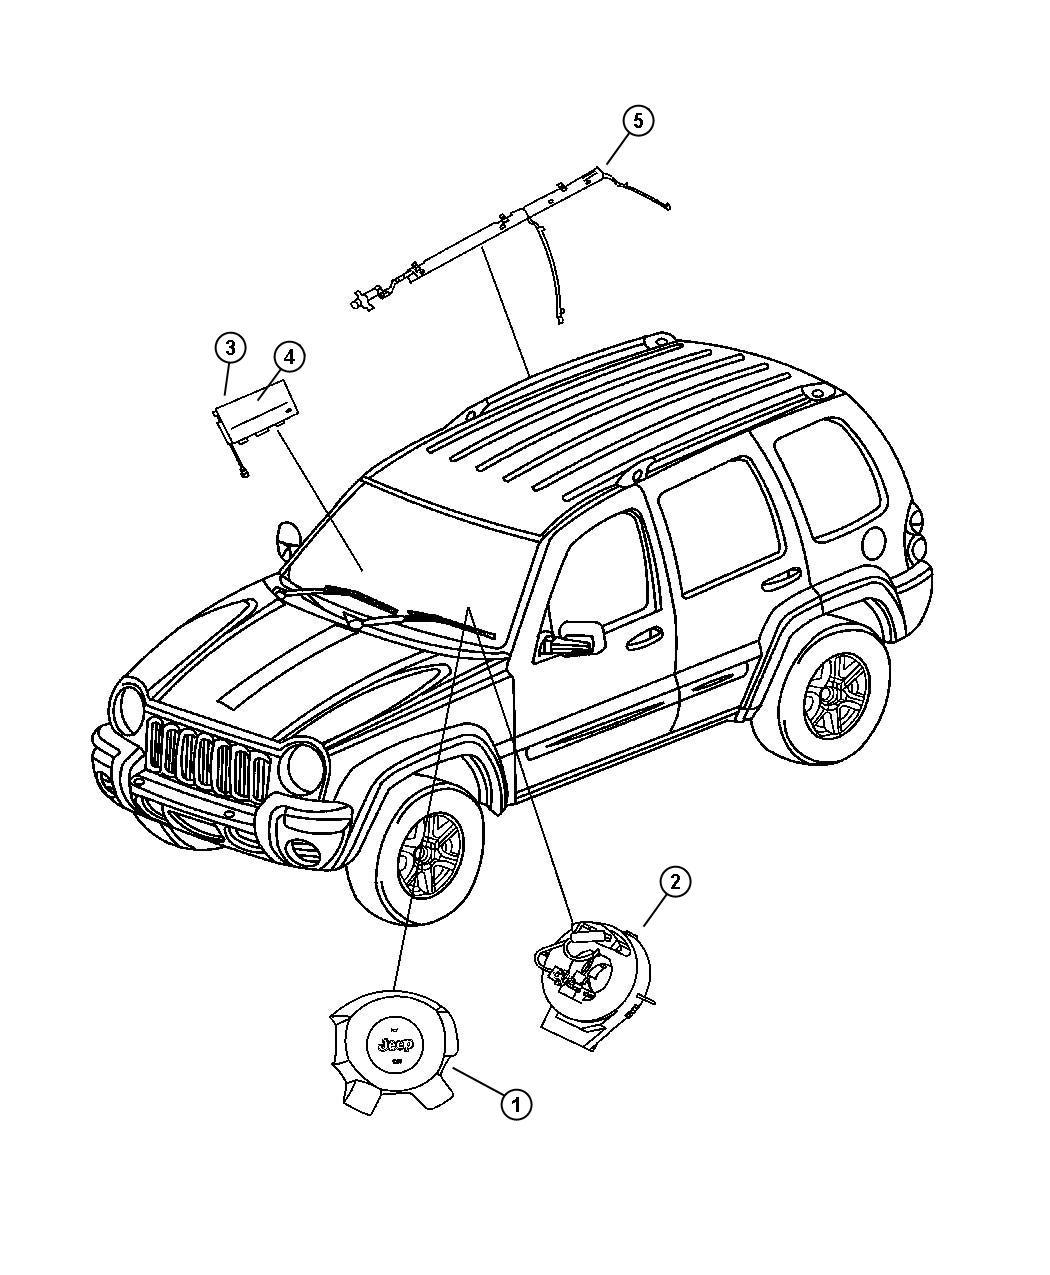 Jeep Liberty Clkspring Program Stability